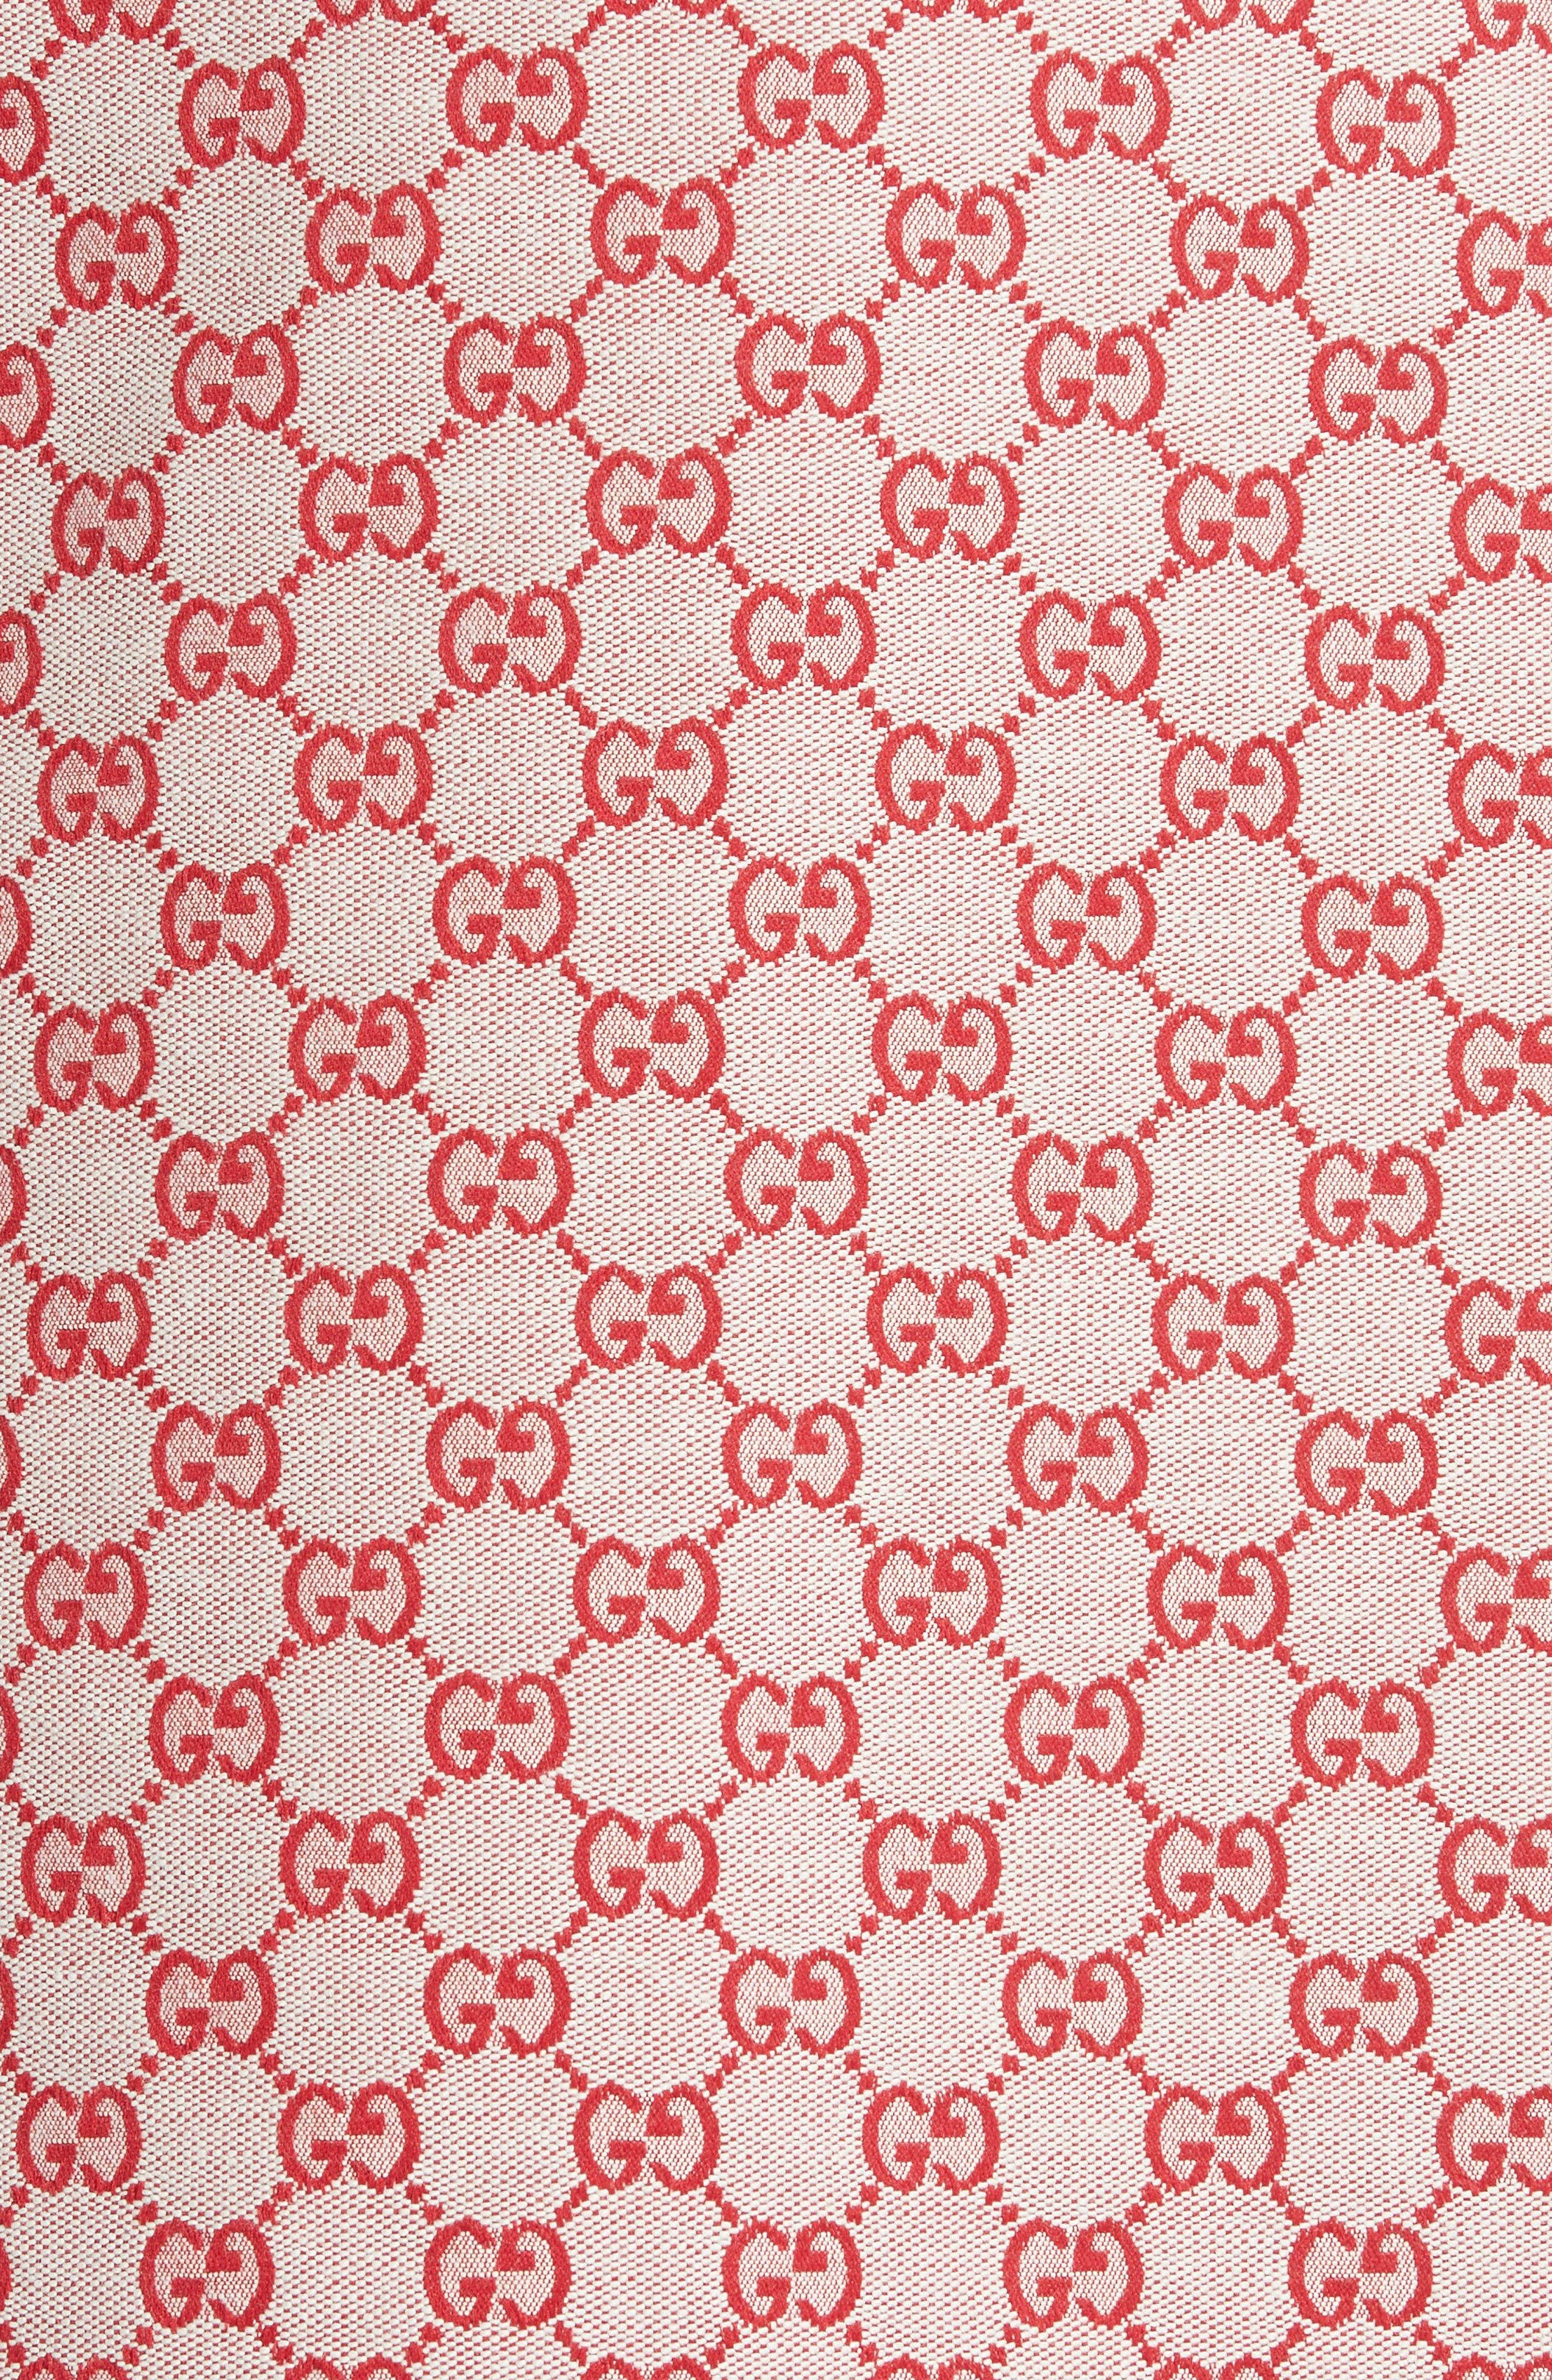 GG Print Canvas A-Line Skirt,                             Alternate thumbnail 5, color,                             GARDENIA/ HIBISCUS RED